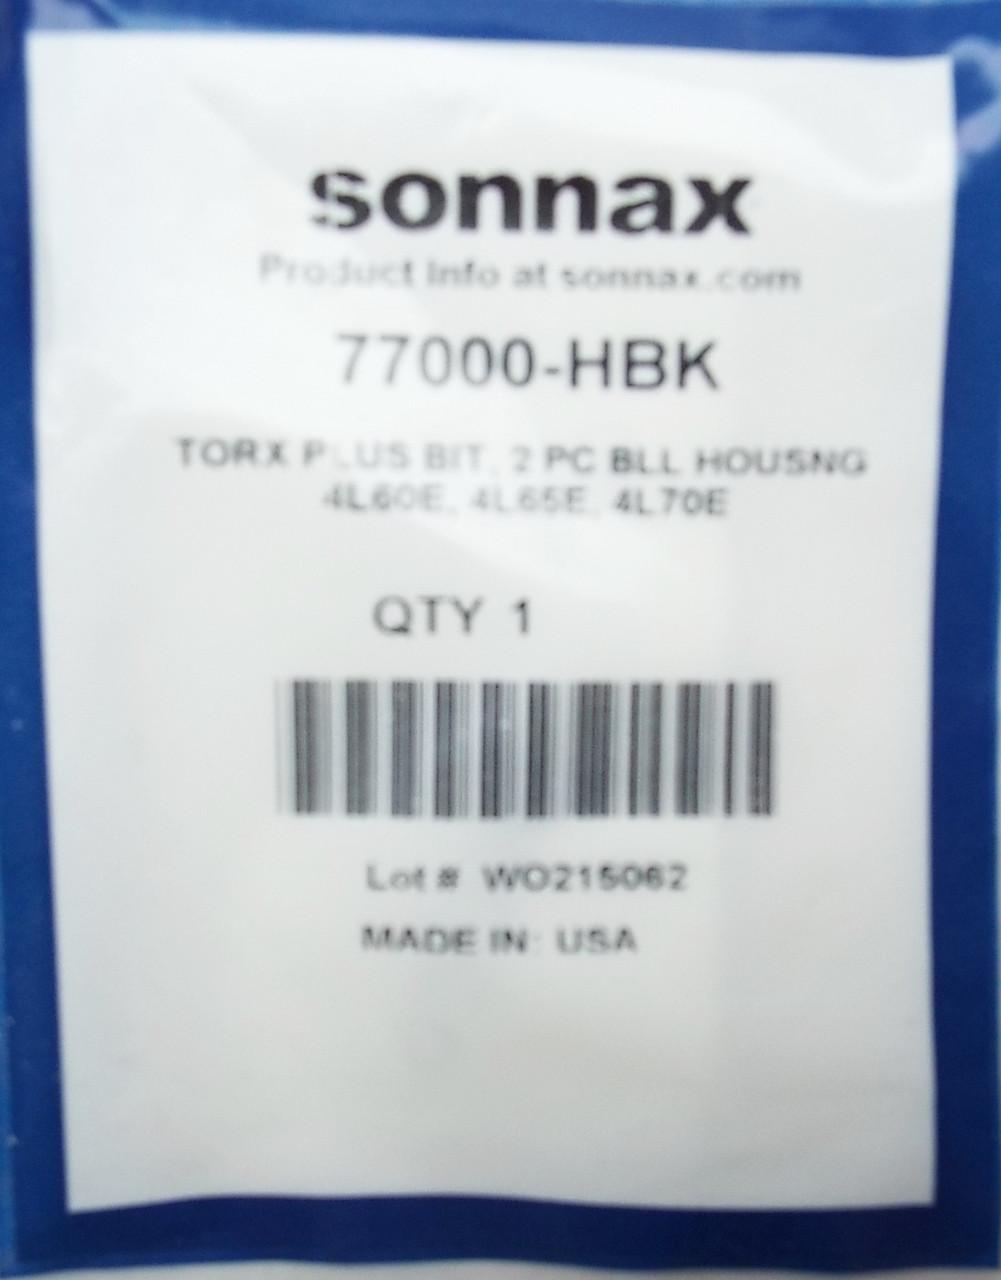 77000-hbk  Torx® Plus Bit 4l60e bell housing bit remove 4l60e bell housing